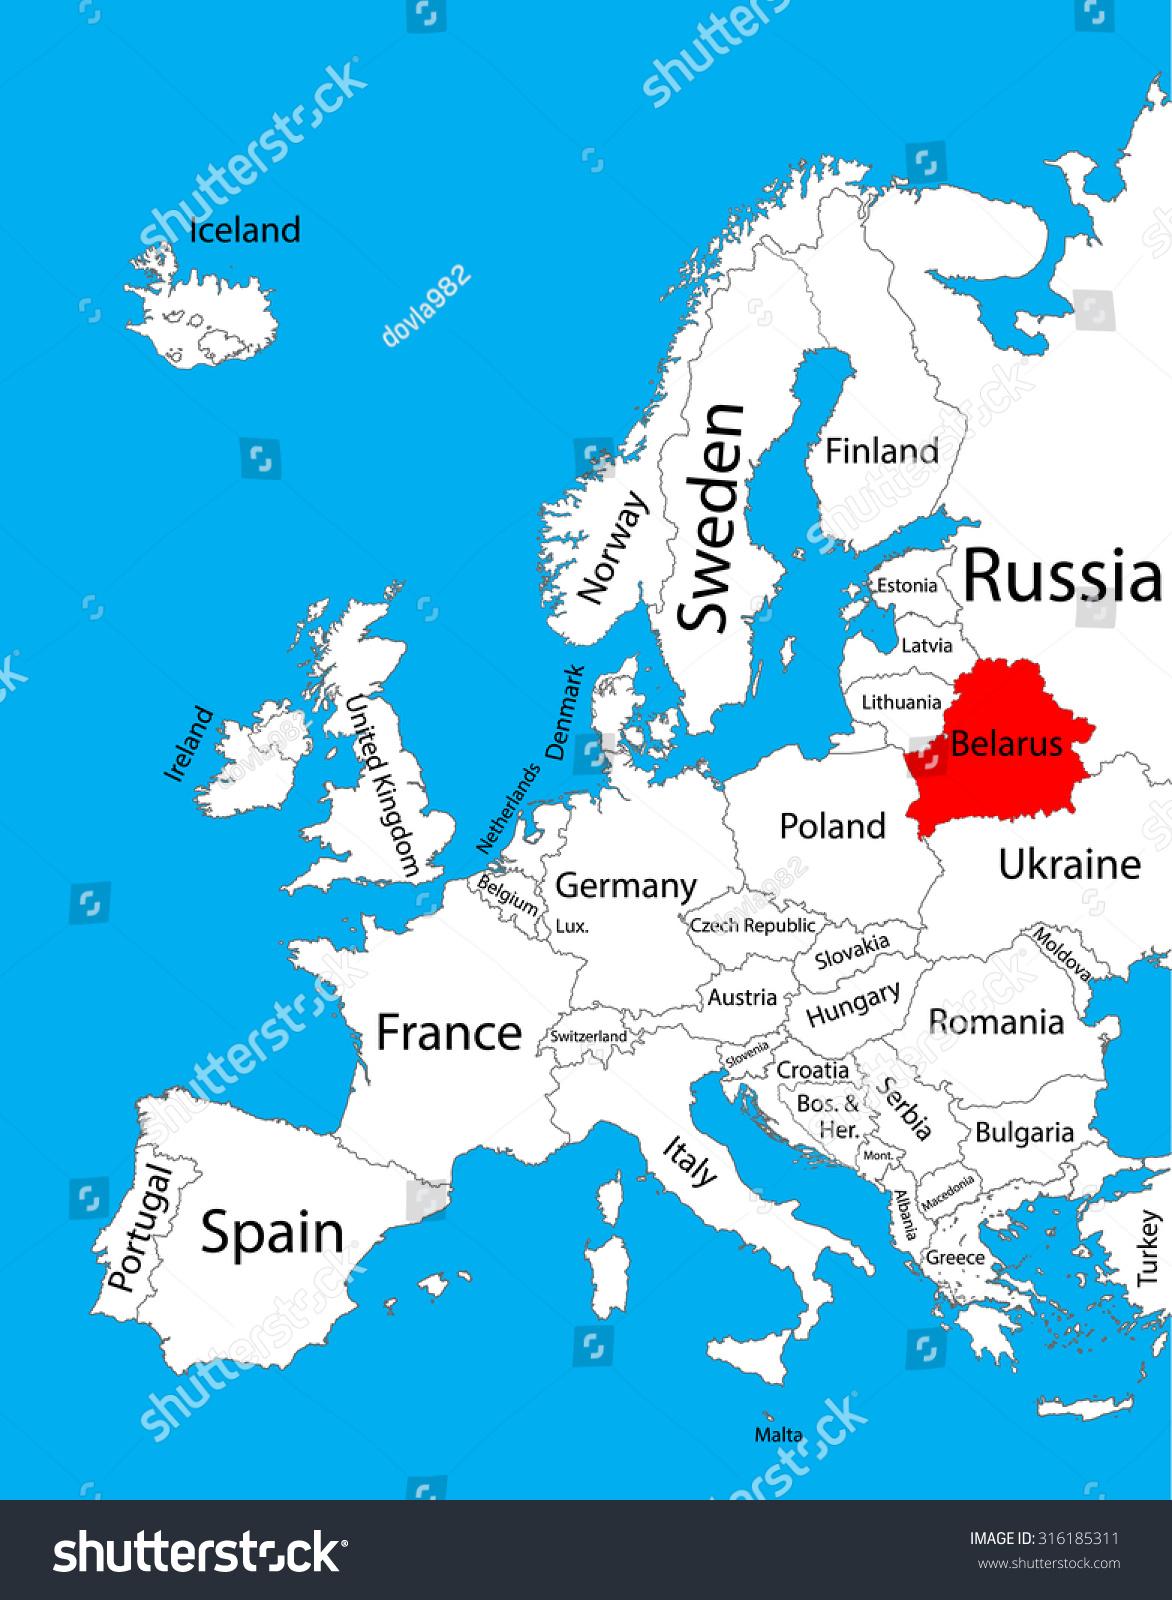 belarus on map of europe Belarus Vector Map Europe Vector Map Stock Vector (Royalty Free